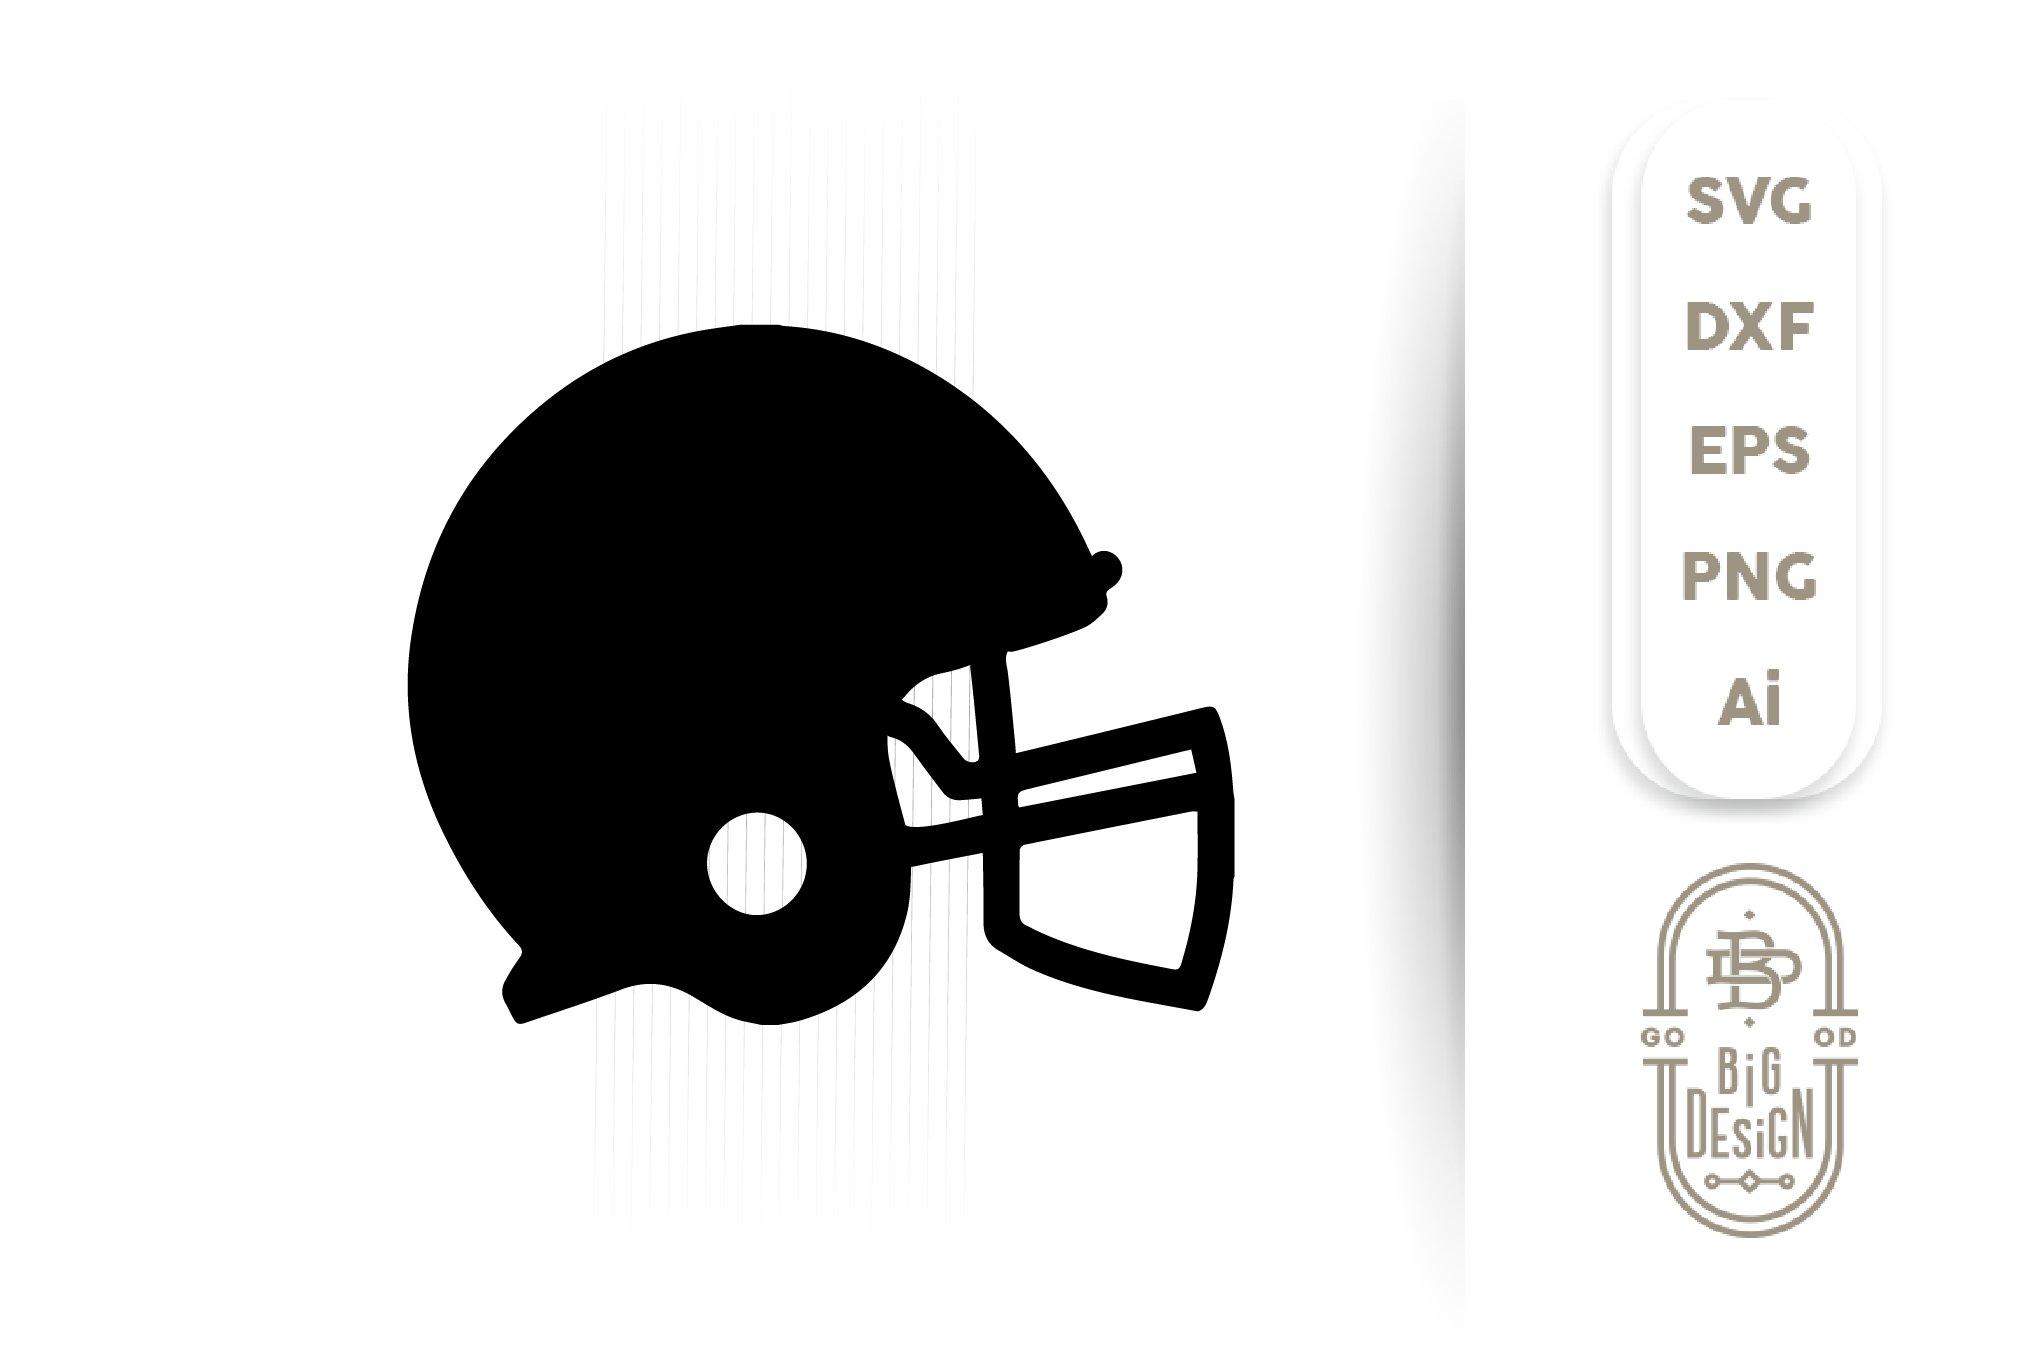 Football Helmet Svg Football Svg Helmet Silhouette 372636 Svgs Design Bundles